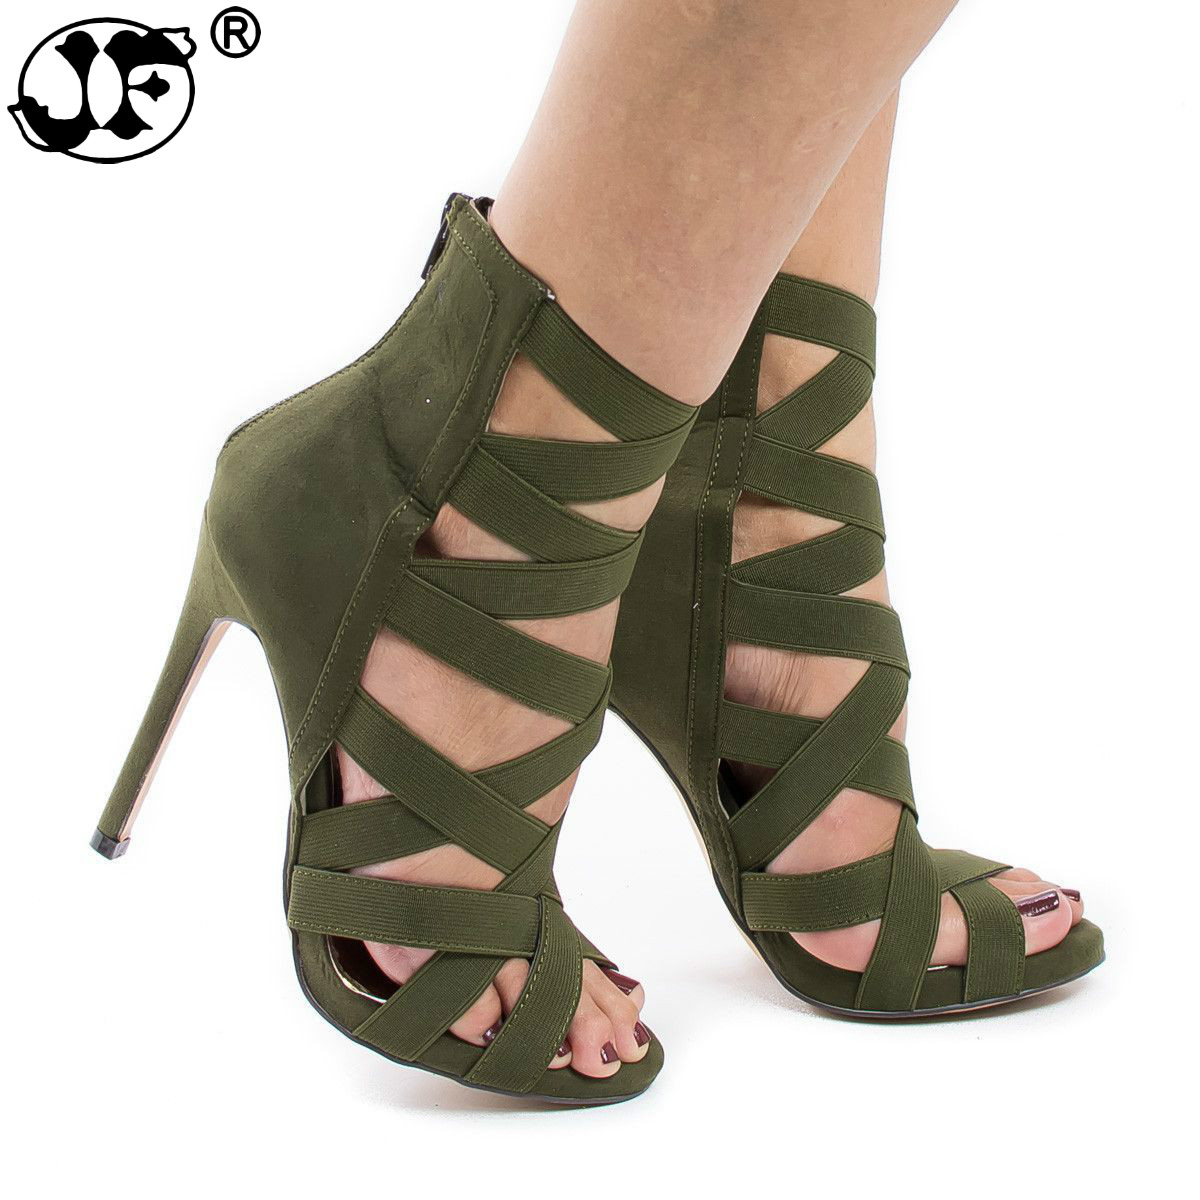 Elane Wedding 2019 Glamorous Shoes High Fashion Heels L Jazzy Club Party Pumps Pretty qUzLjMVpGS